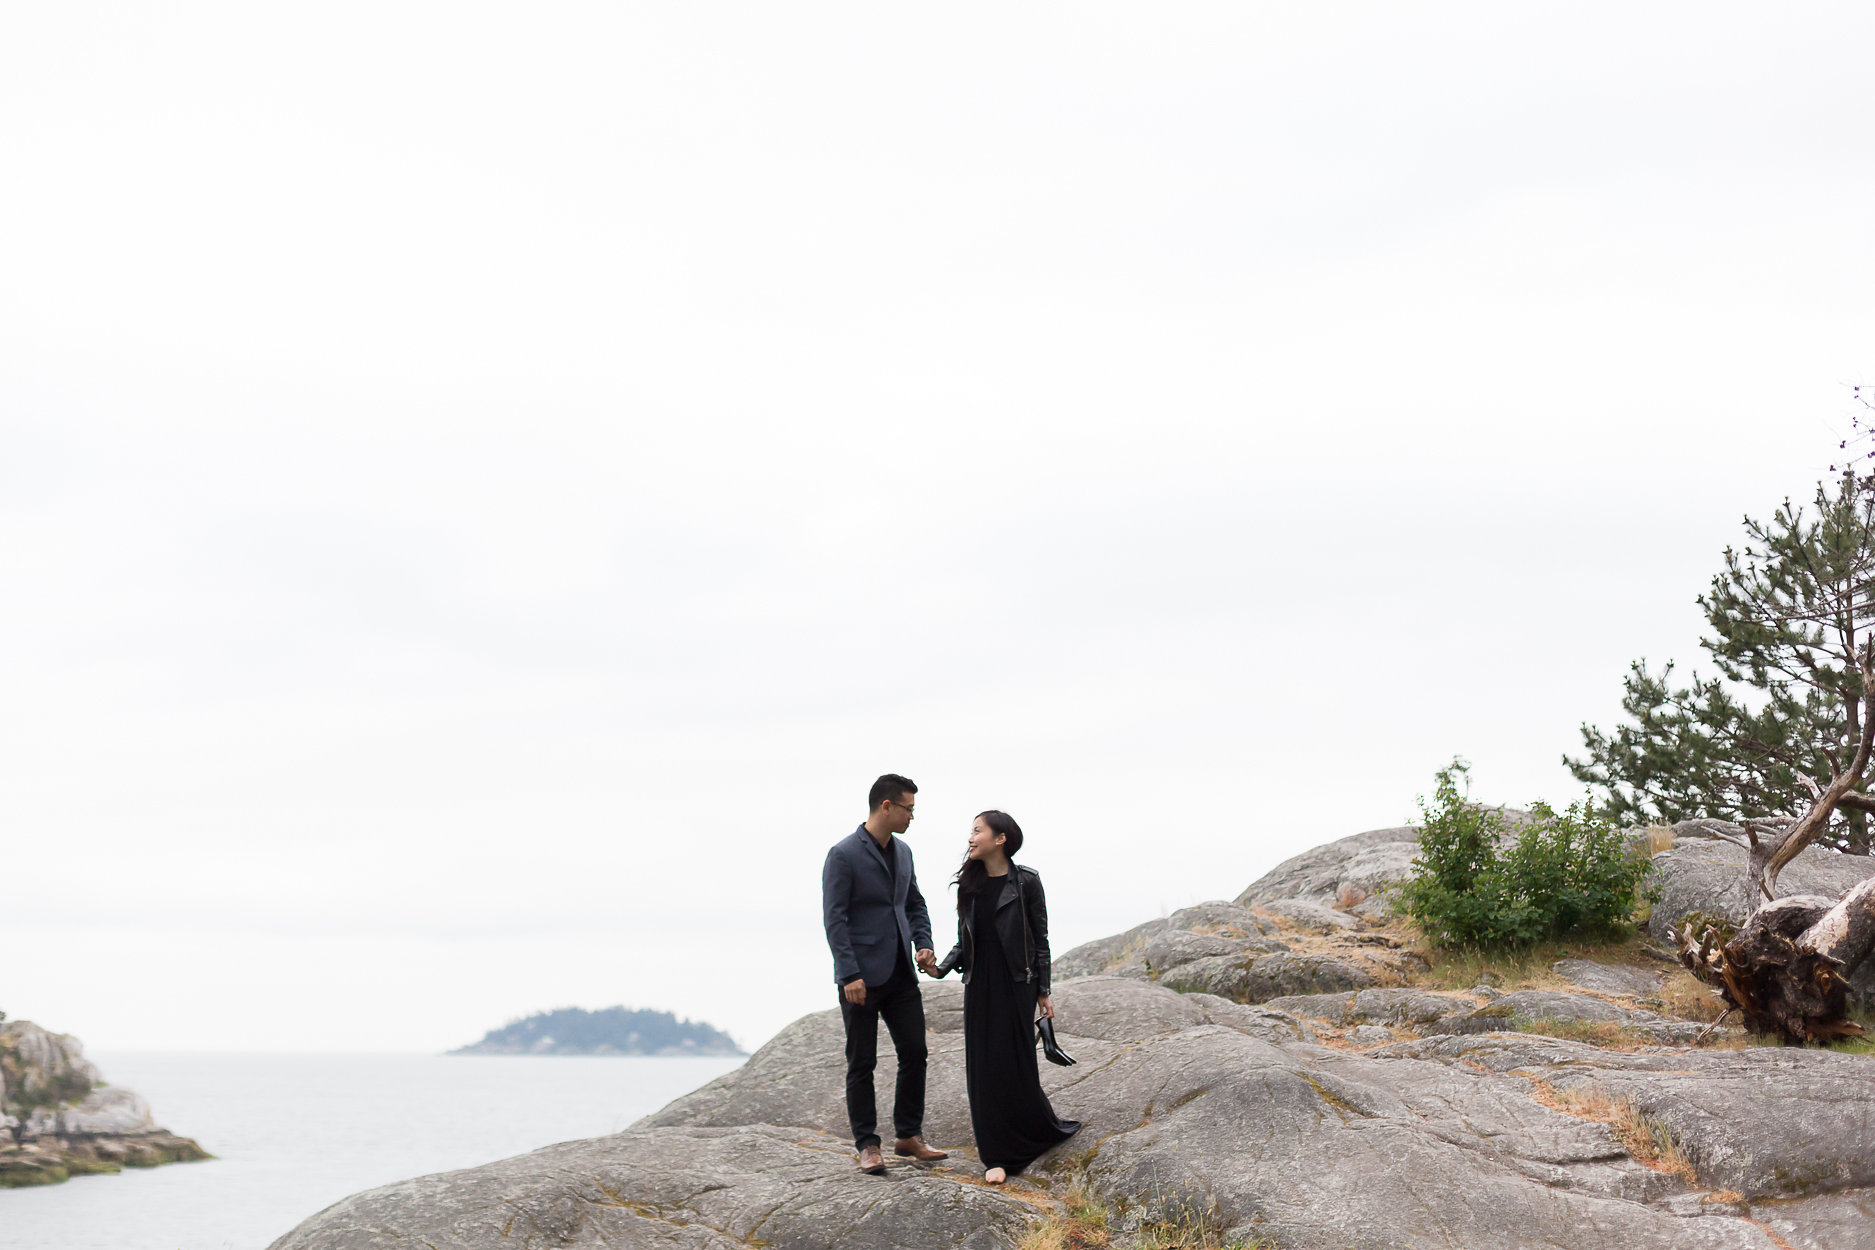 Jenny-Liu-PhotographyJen&Brian-Engagement-7961.jpg